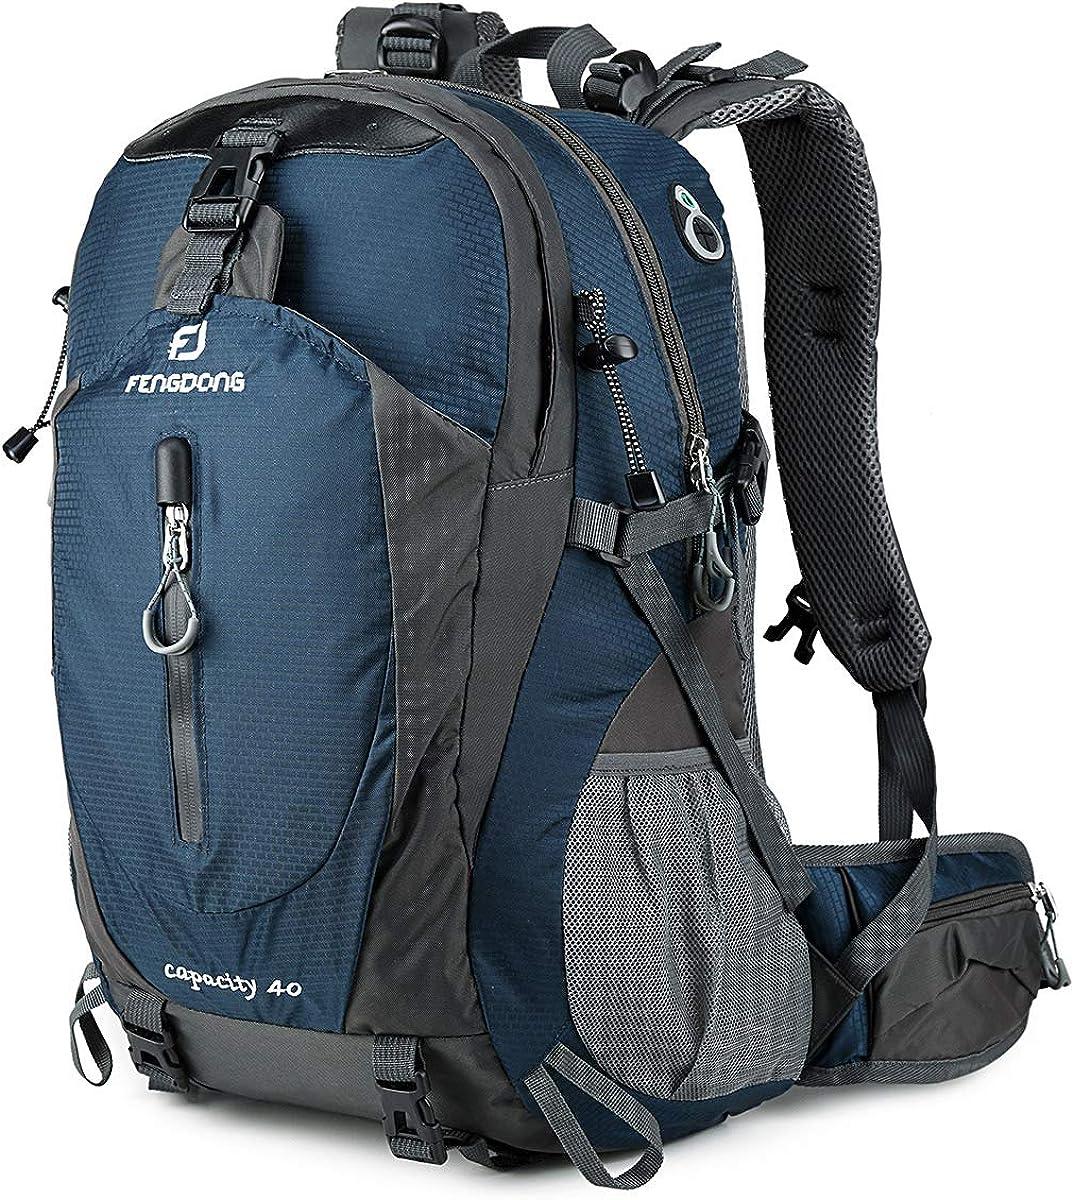 40L Large Waterproof Rucksack Hiking Camping Bag Travel Backpack Outdoor Luggage